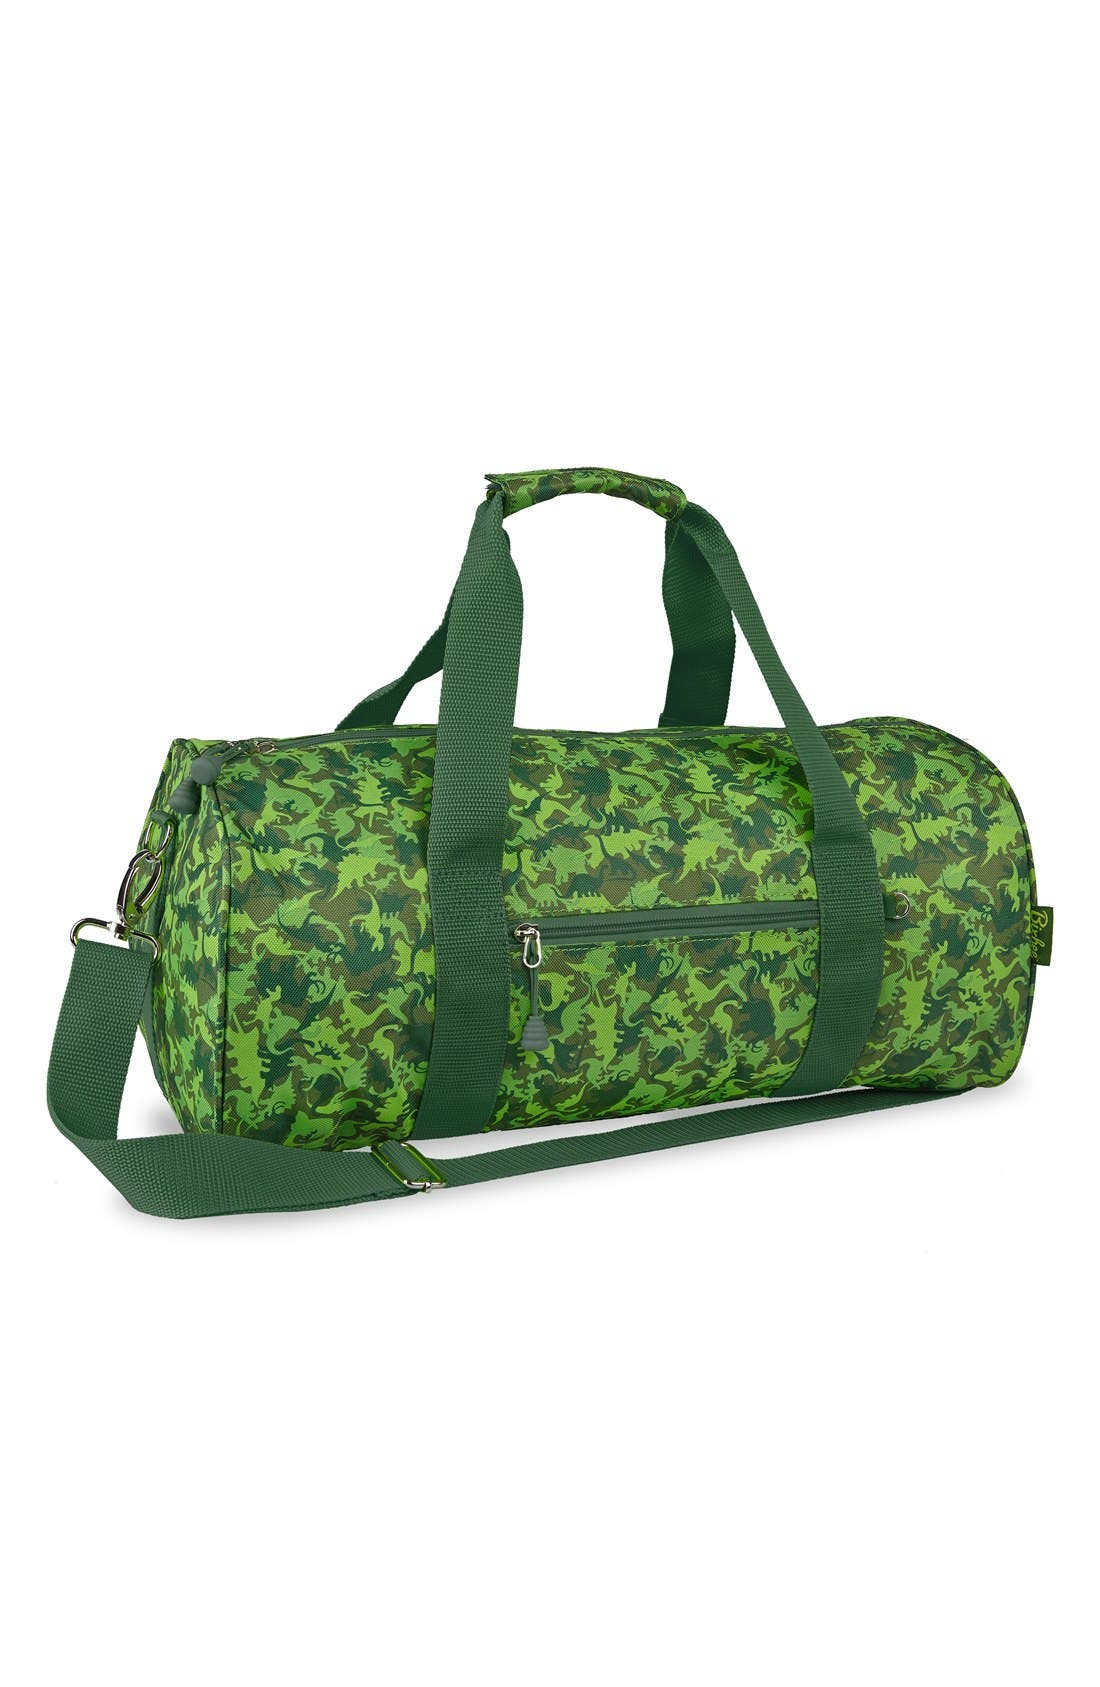 BIXBEE Large Dino Camo Sports Duffel Bag